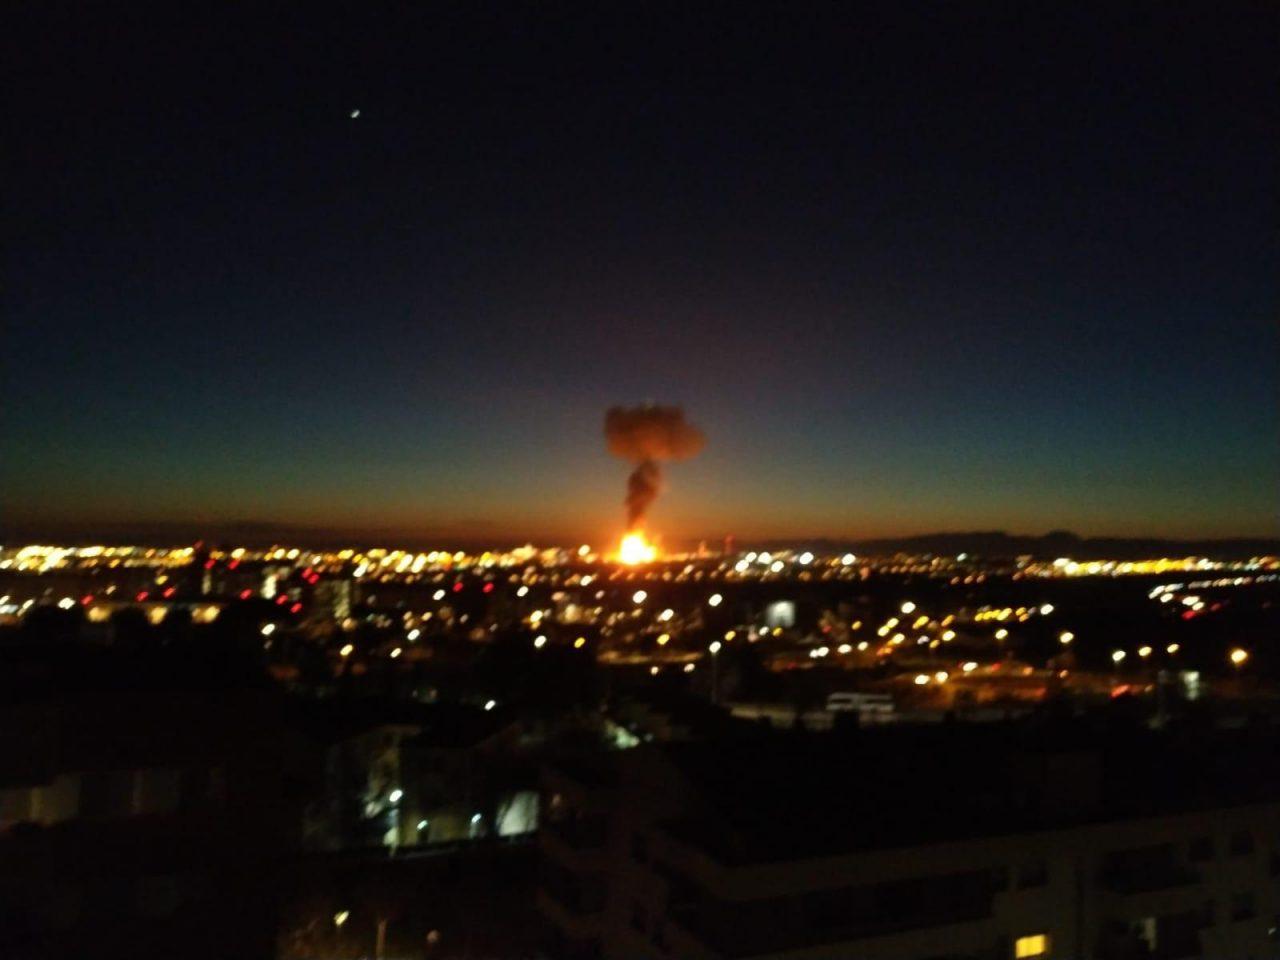 incendi_quimica-1280x960.jpg